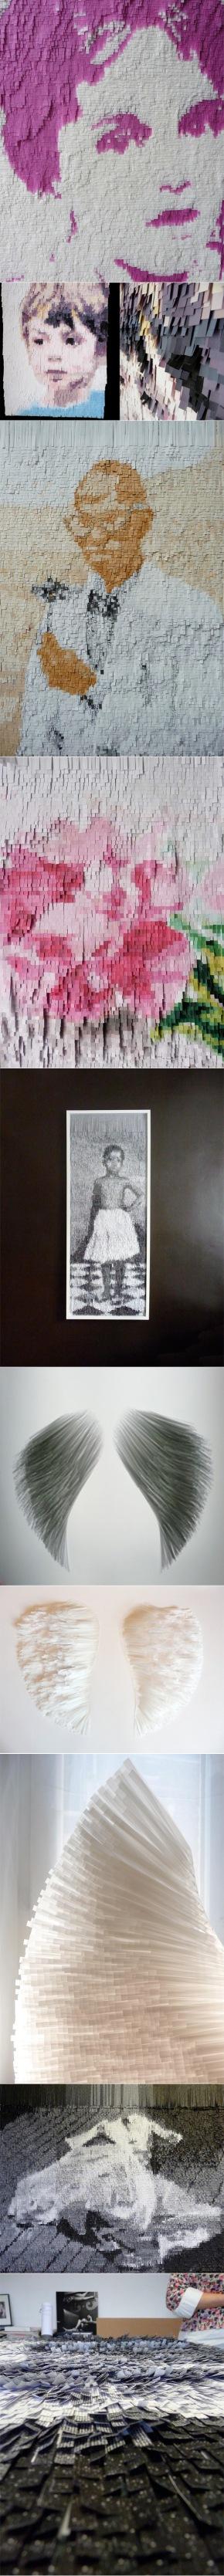 Nathalie-Boutté paper strips 1